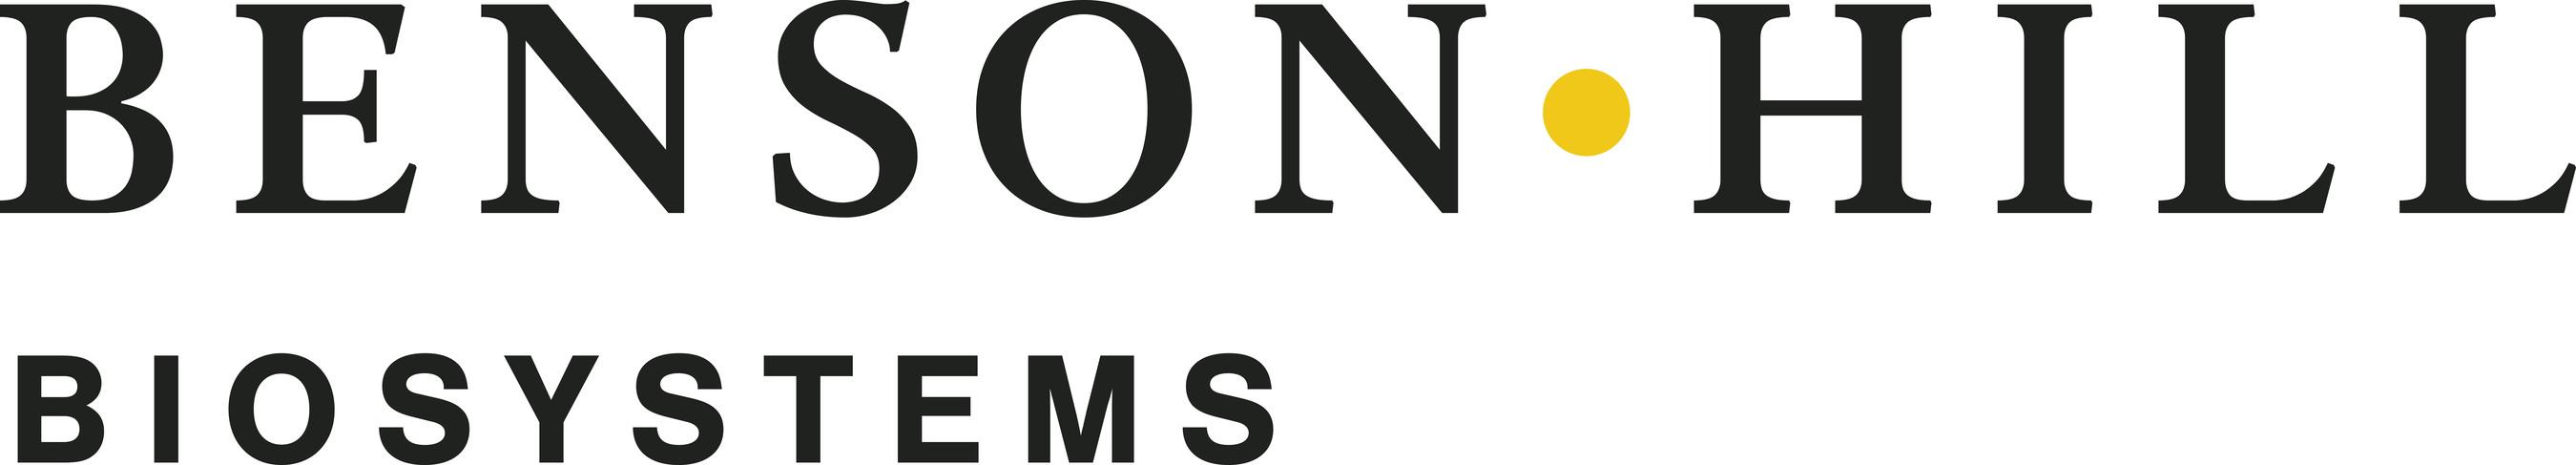 Benson Hill Biosystems, Inc.